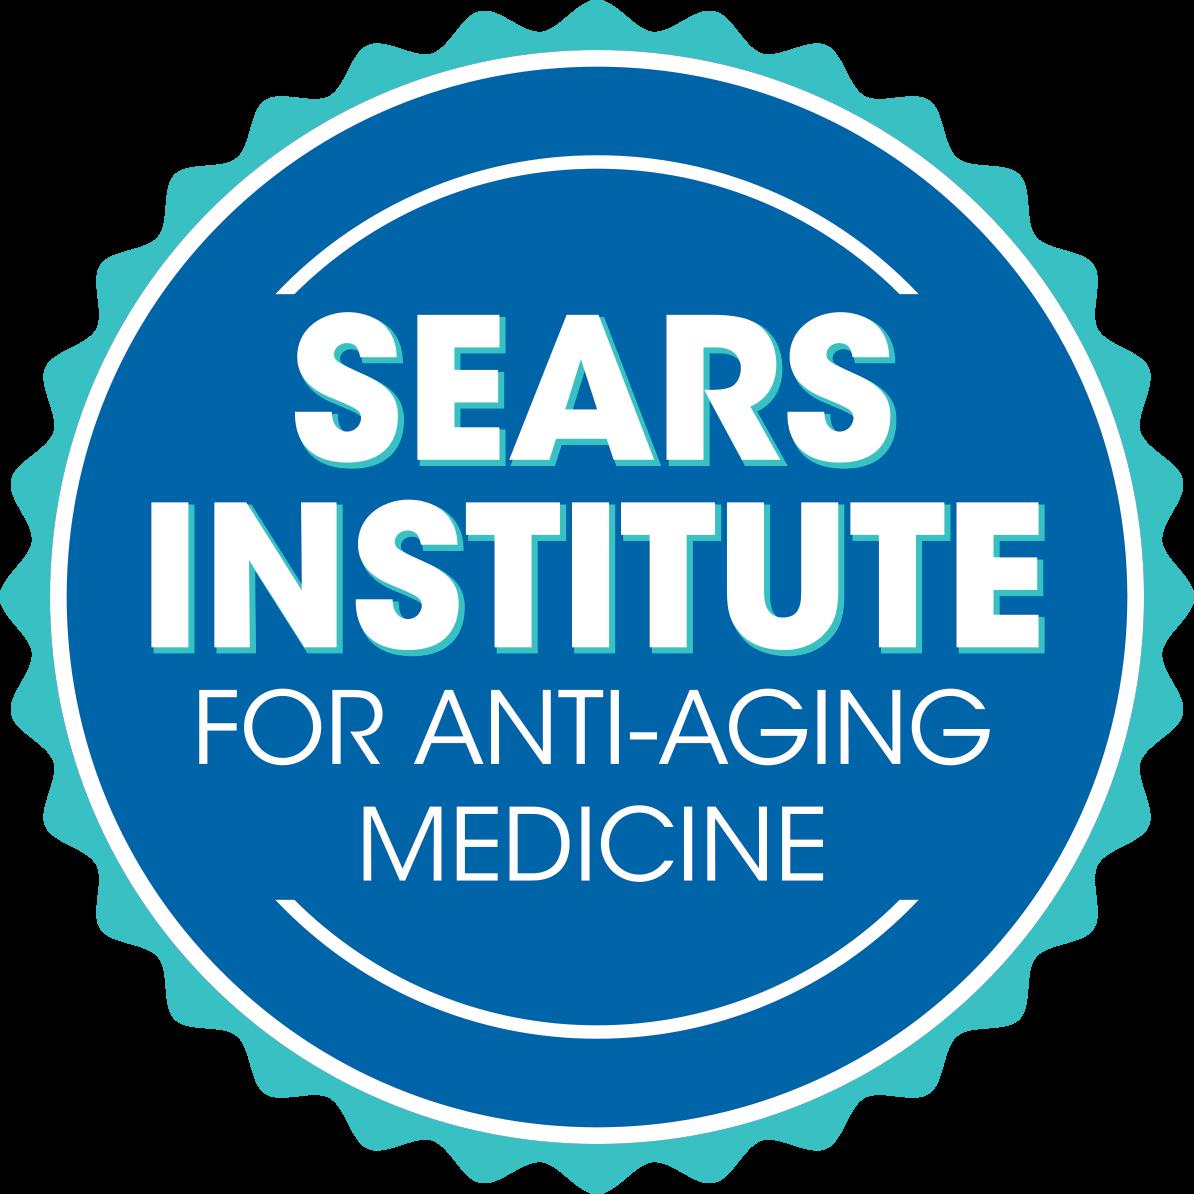 Sears Institute for Anti-Aging Medicine